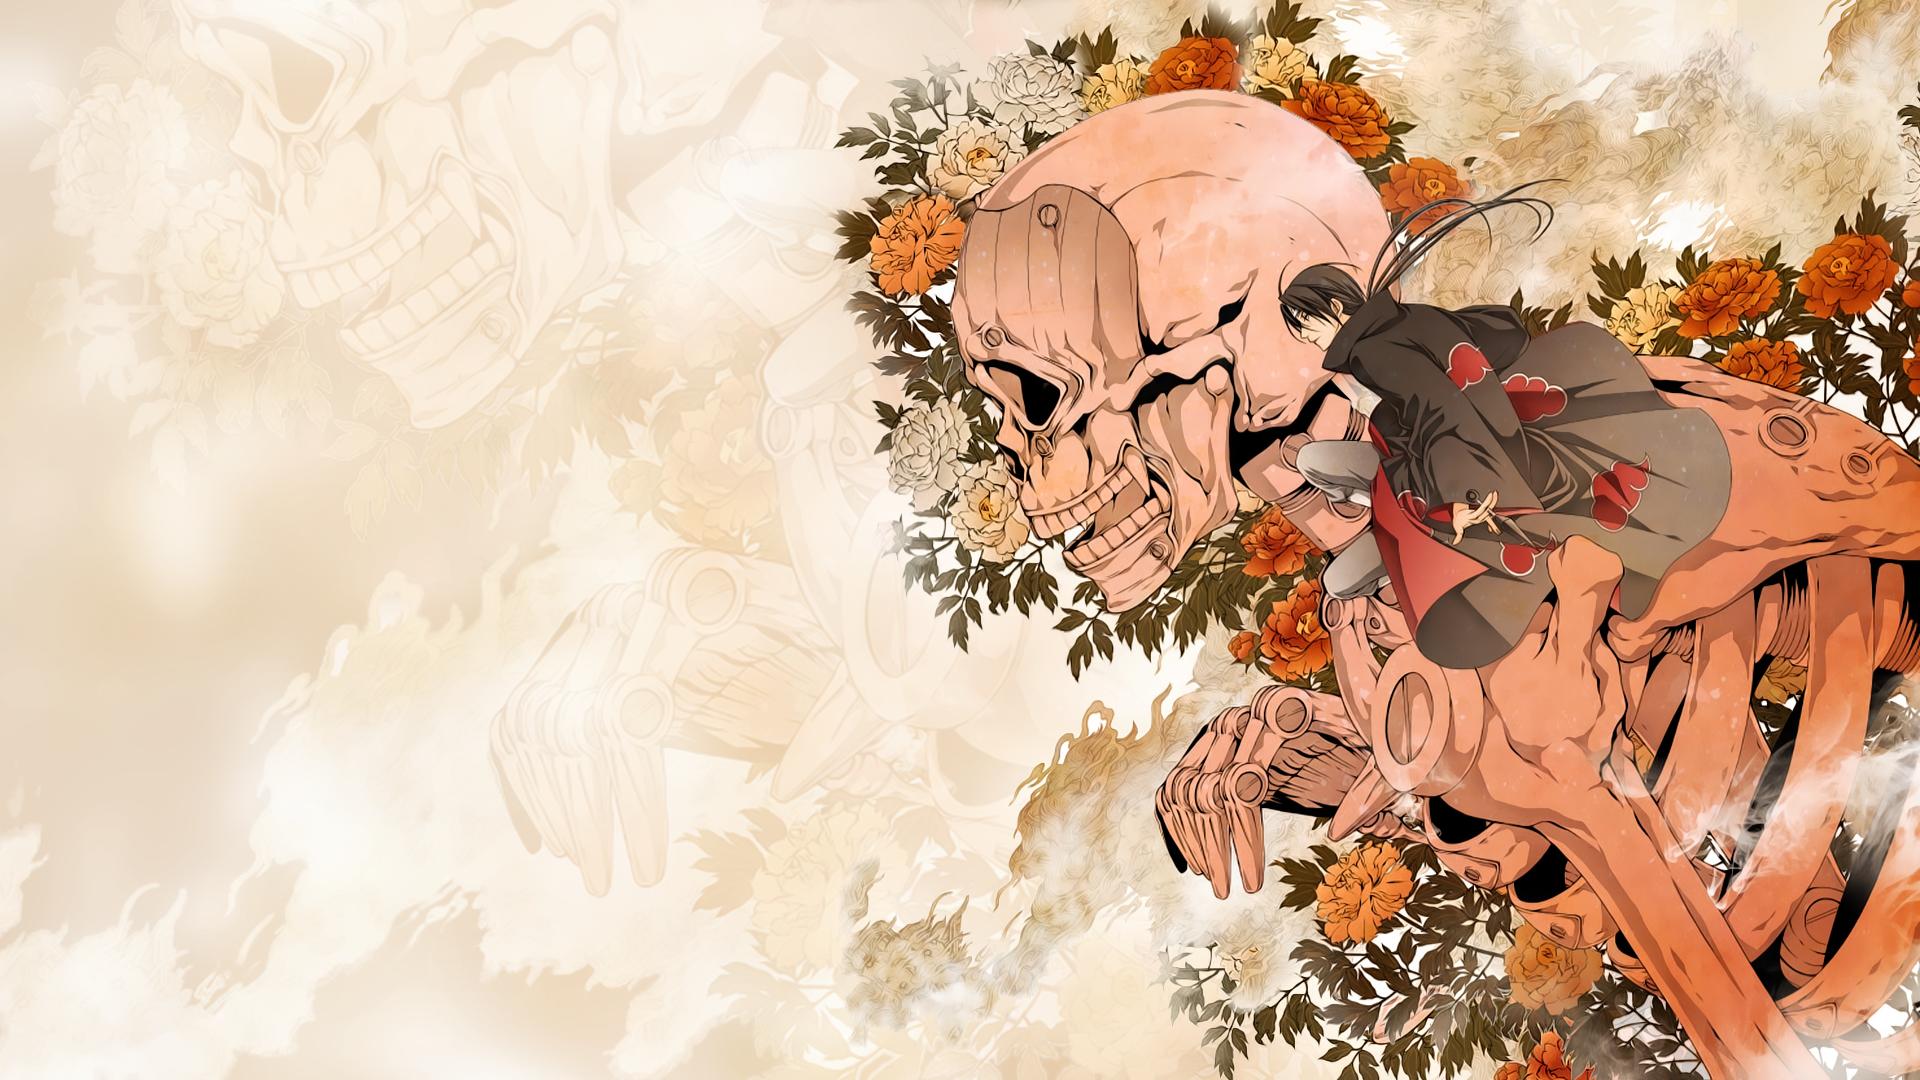 itachi_susanoo_wallpaper_by_iamfx-d9p9a6